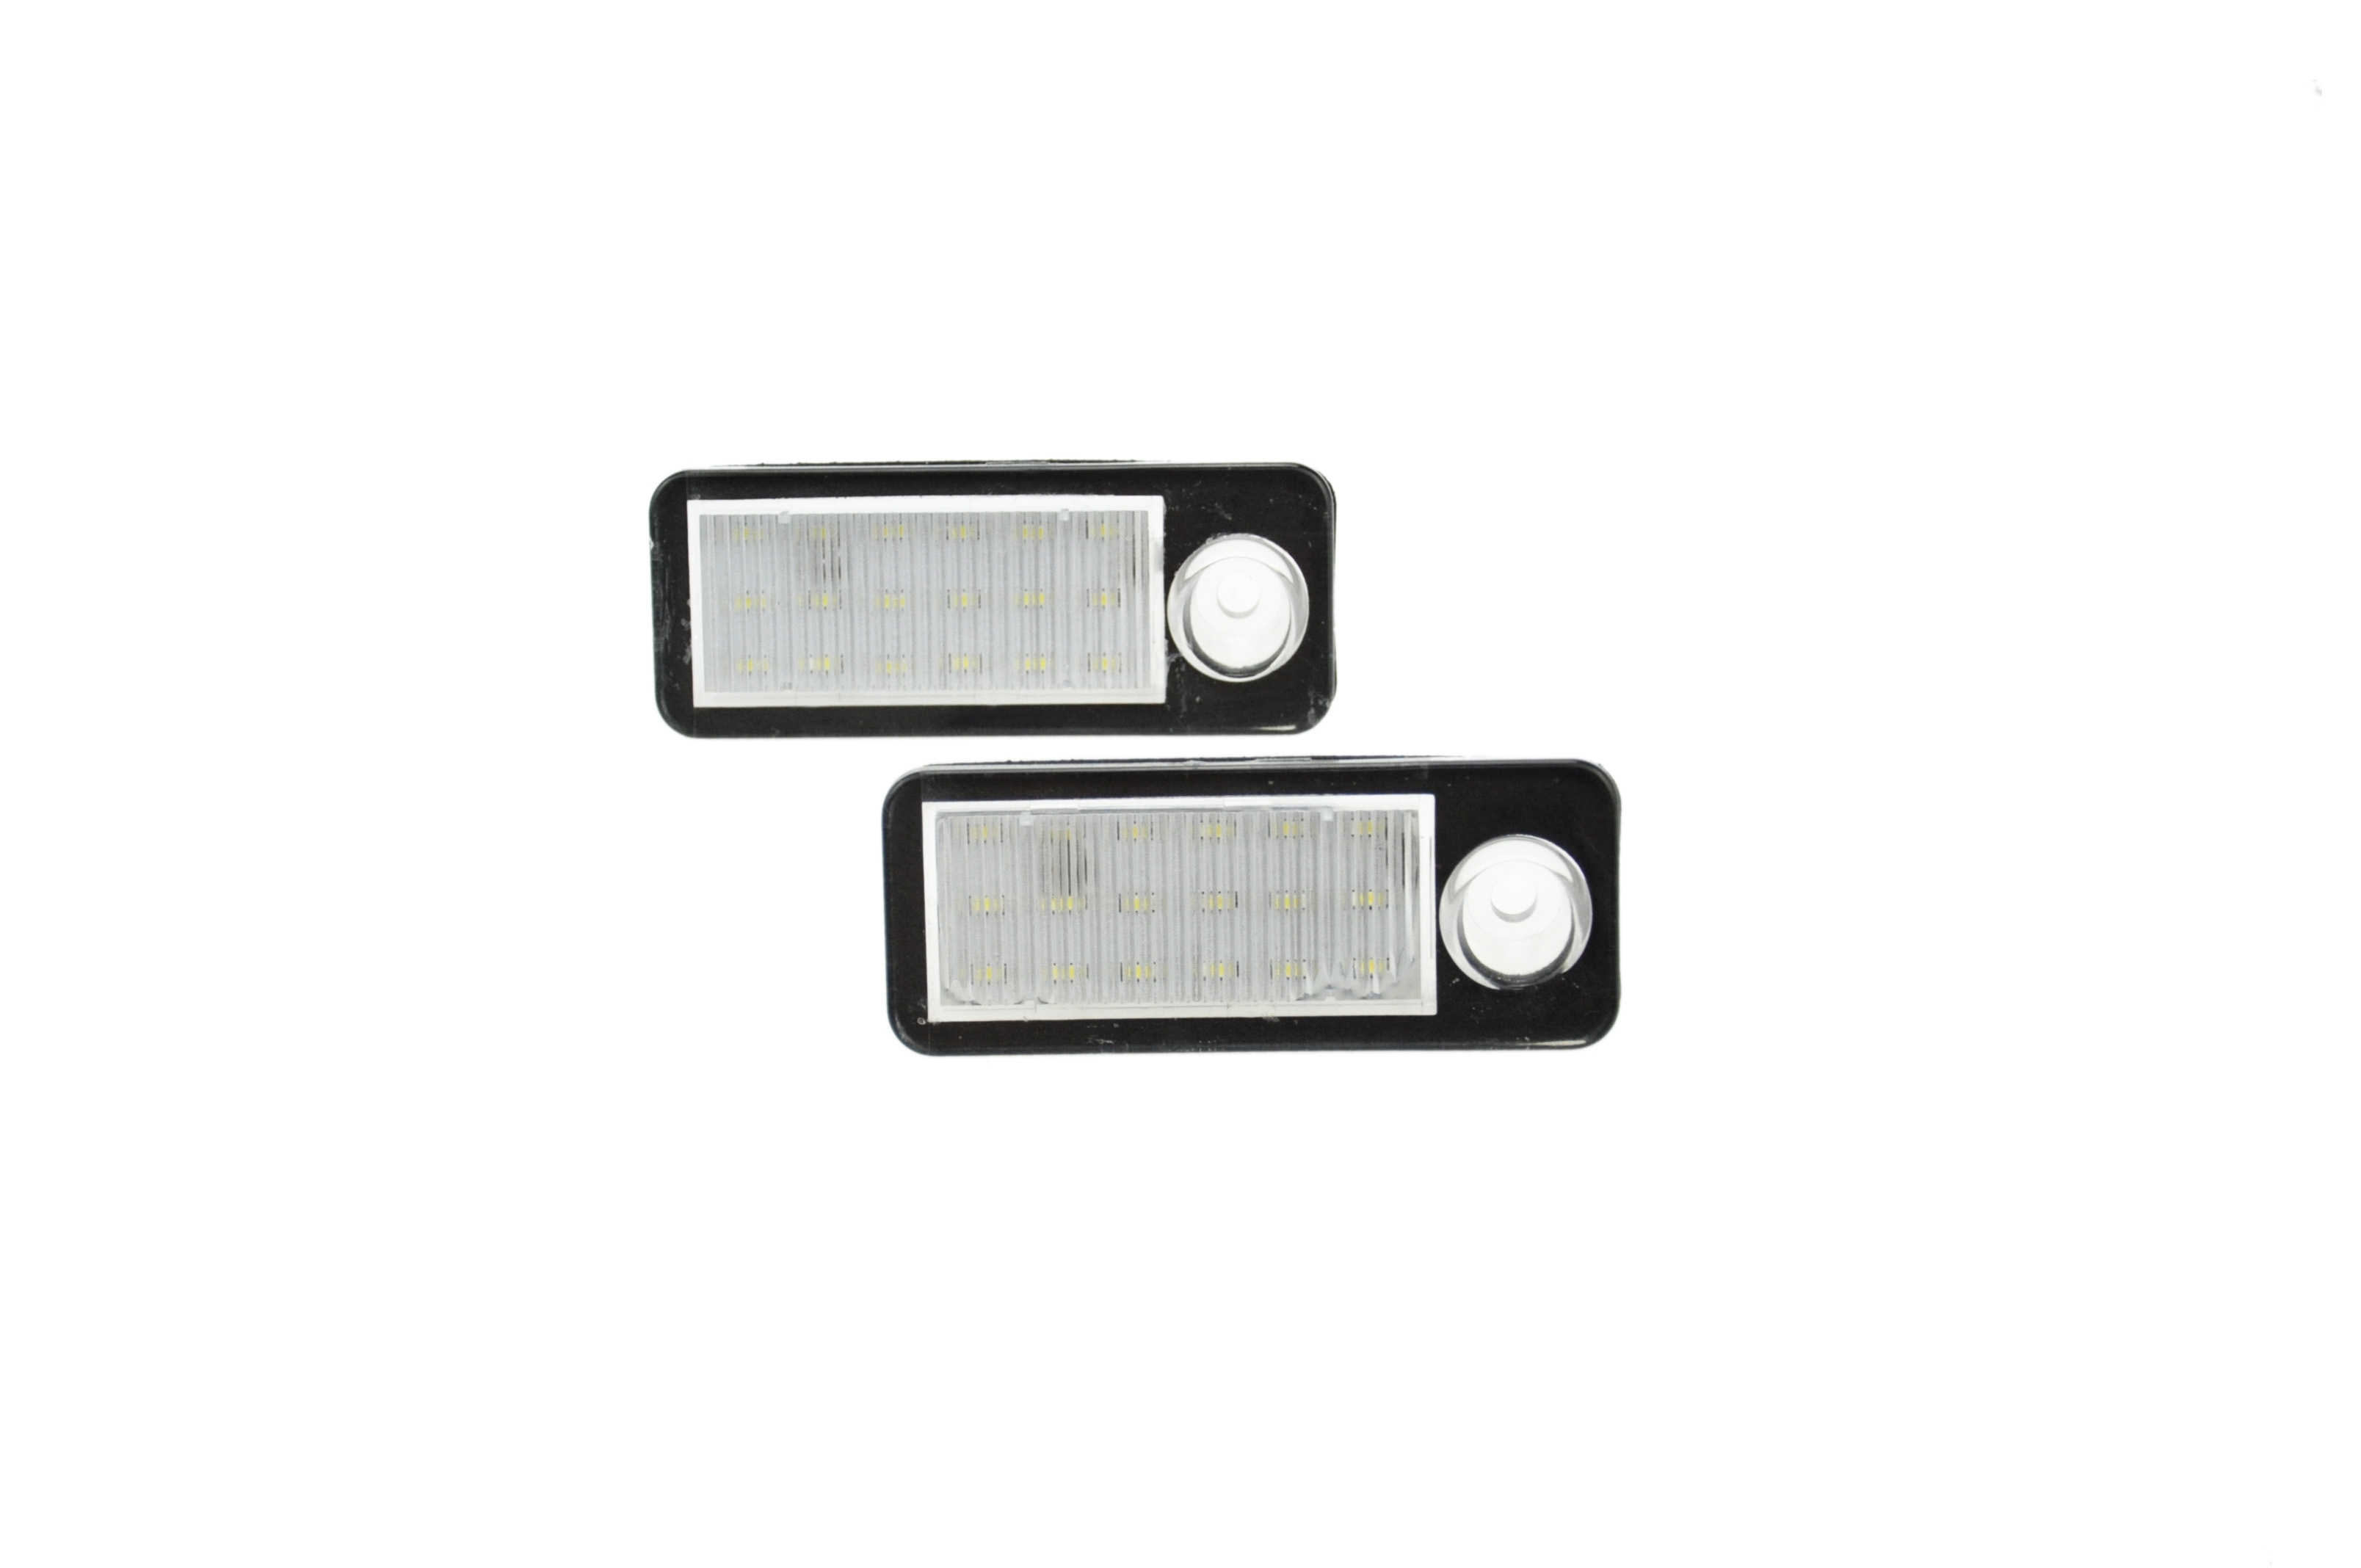 led kennzeichen beleuchtung power leds inkl e pr fzeichen passend f r audi a6 c5 4b avant 98. Black Bedroom Furniture Sets. Home Design Ideas